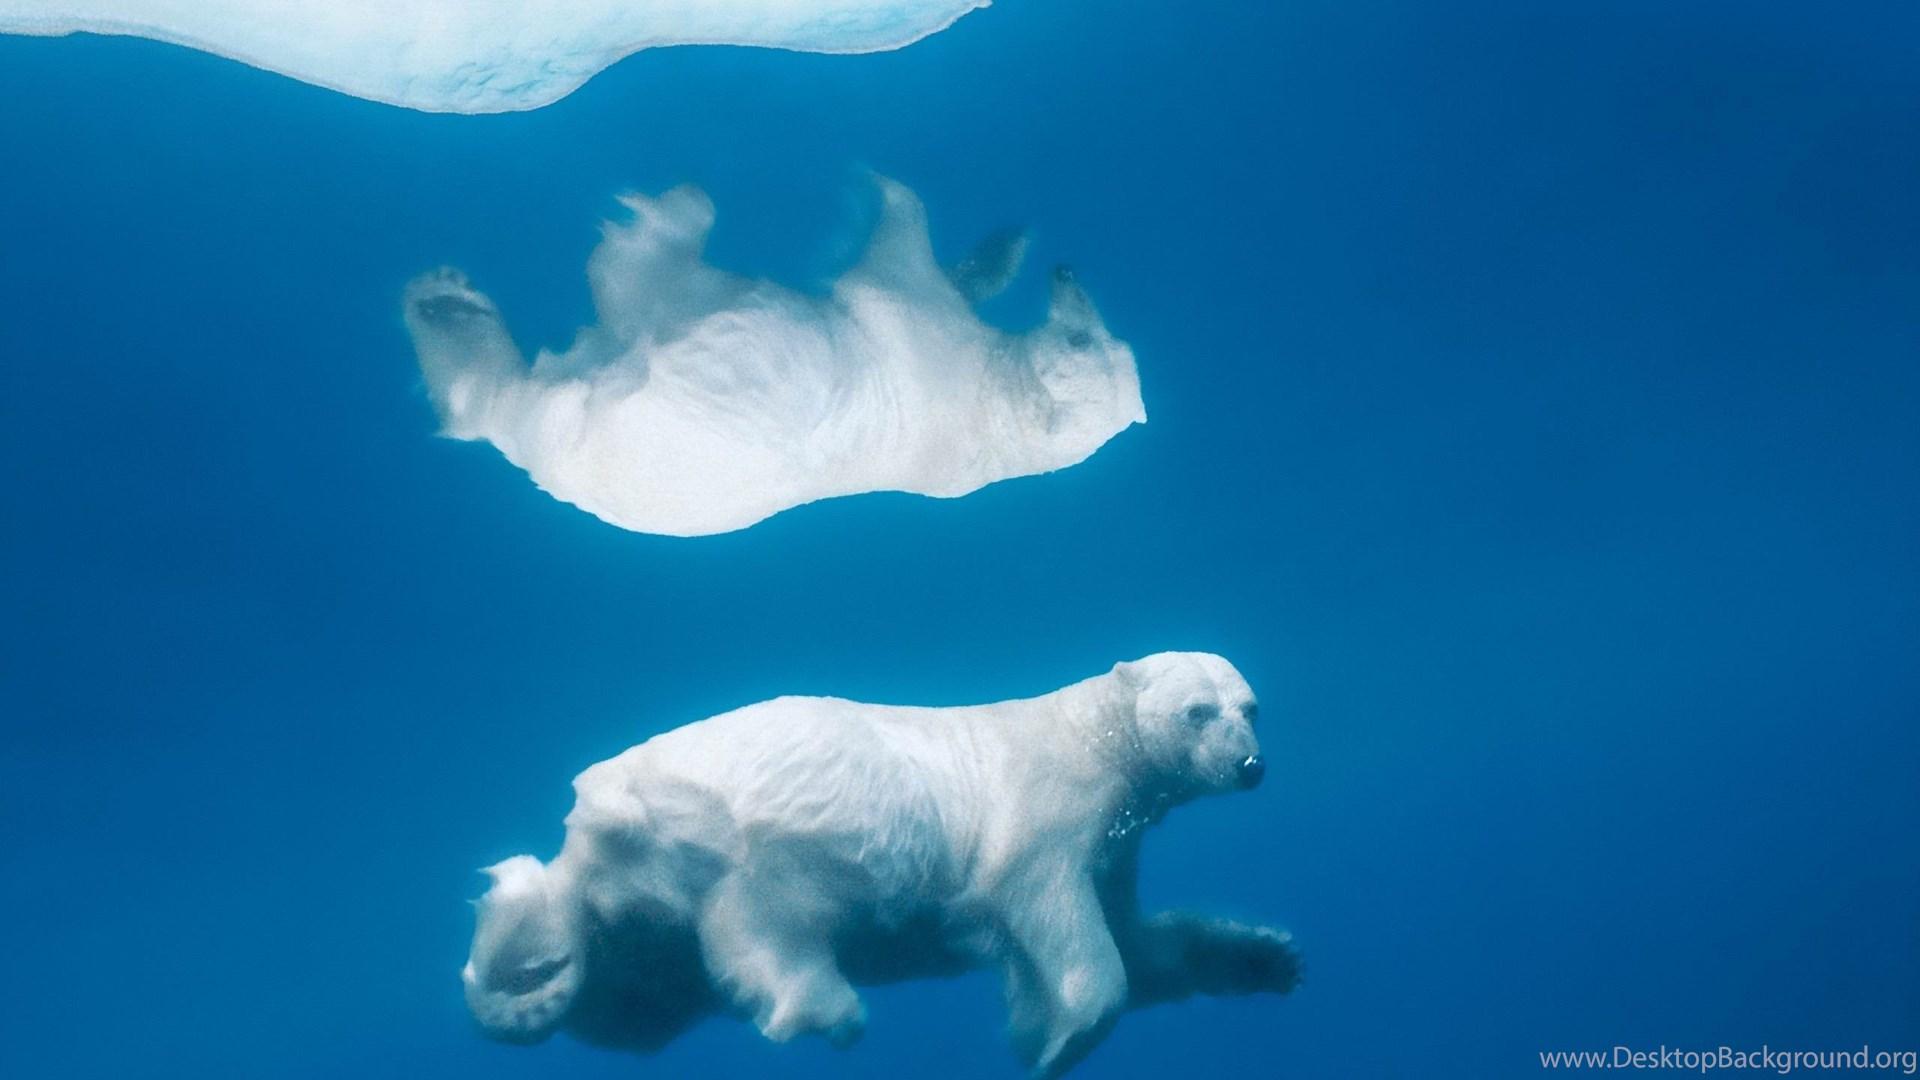 The Polar Bear Under The Ice Mac Os X Mountain Lion Hd Wallpapers